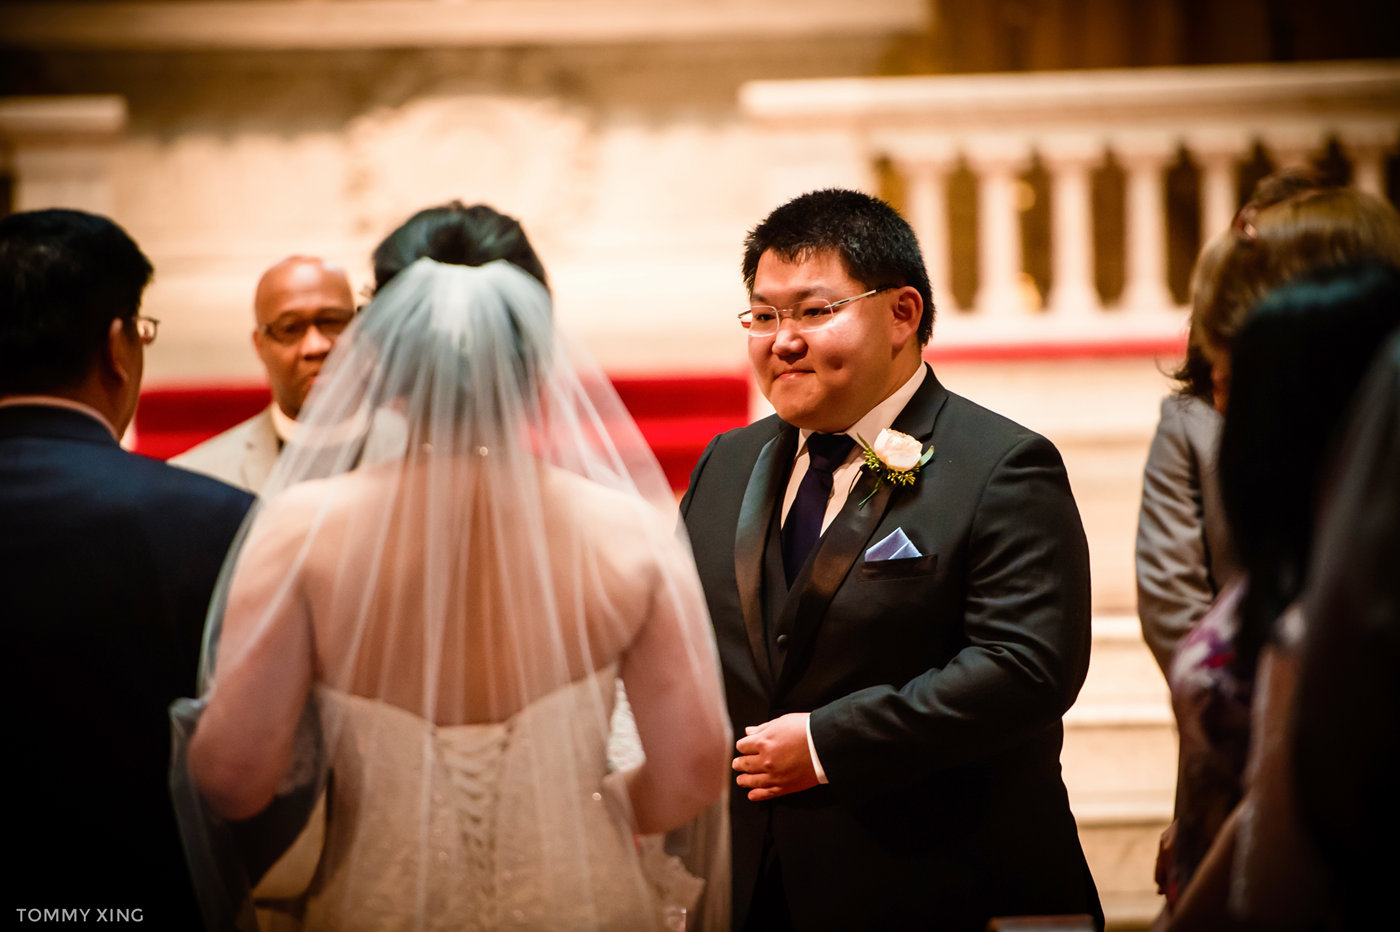 STANFORD MEMORIAL CHURCH WEDDING - Wenjie & Chengcheng - SAN FRANCISCO BAY AREA 斯坦福教堂婚礼跟拍 - 洛杉矶婚礼婚纱照摄影师 Tommy Xing Photography080.jpg